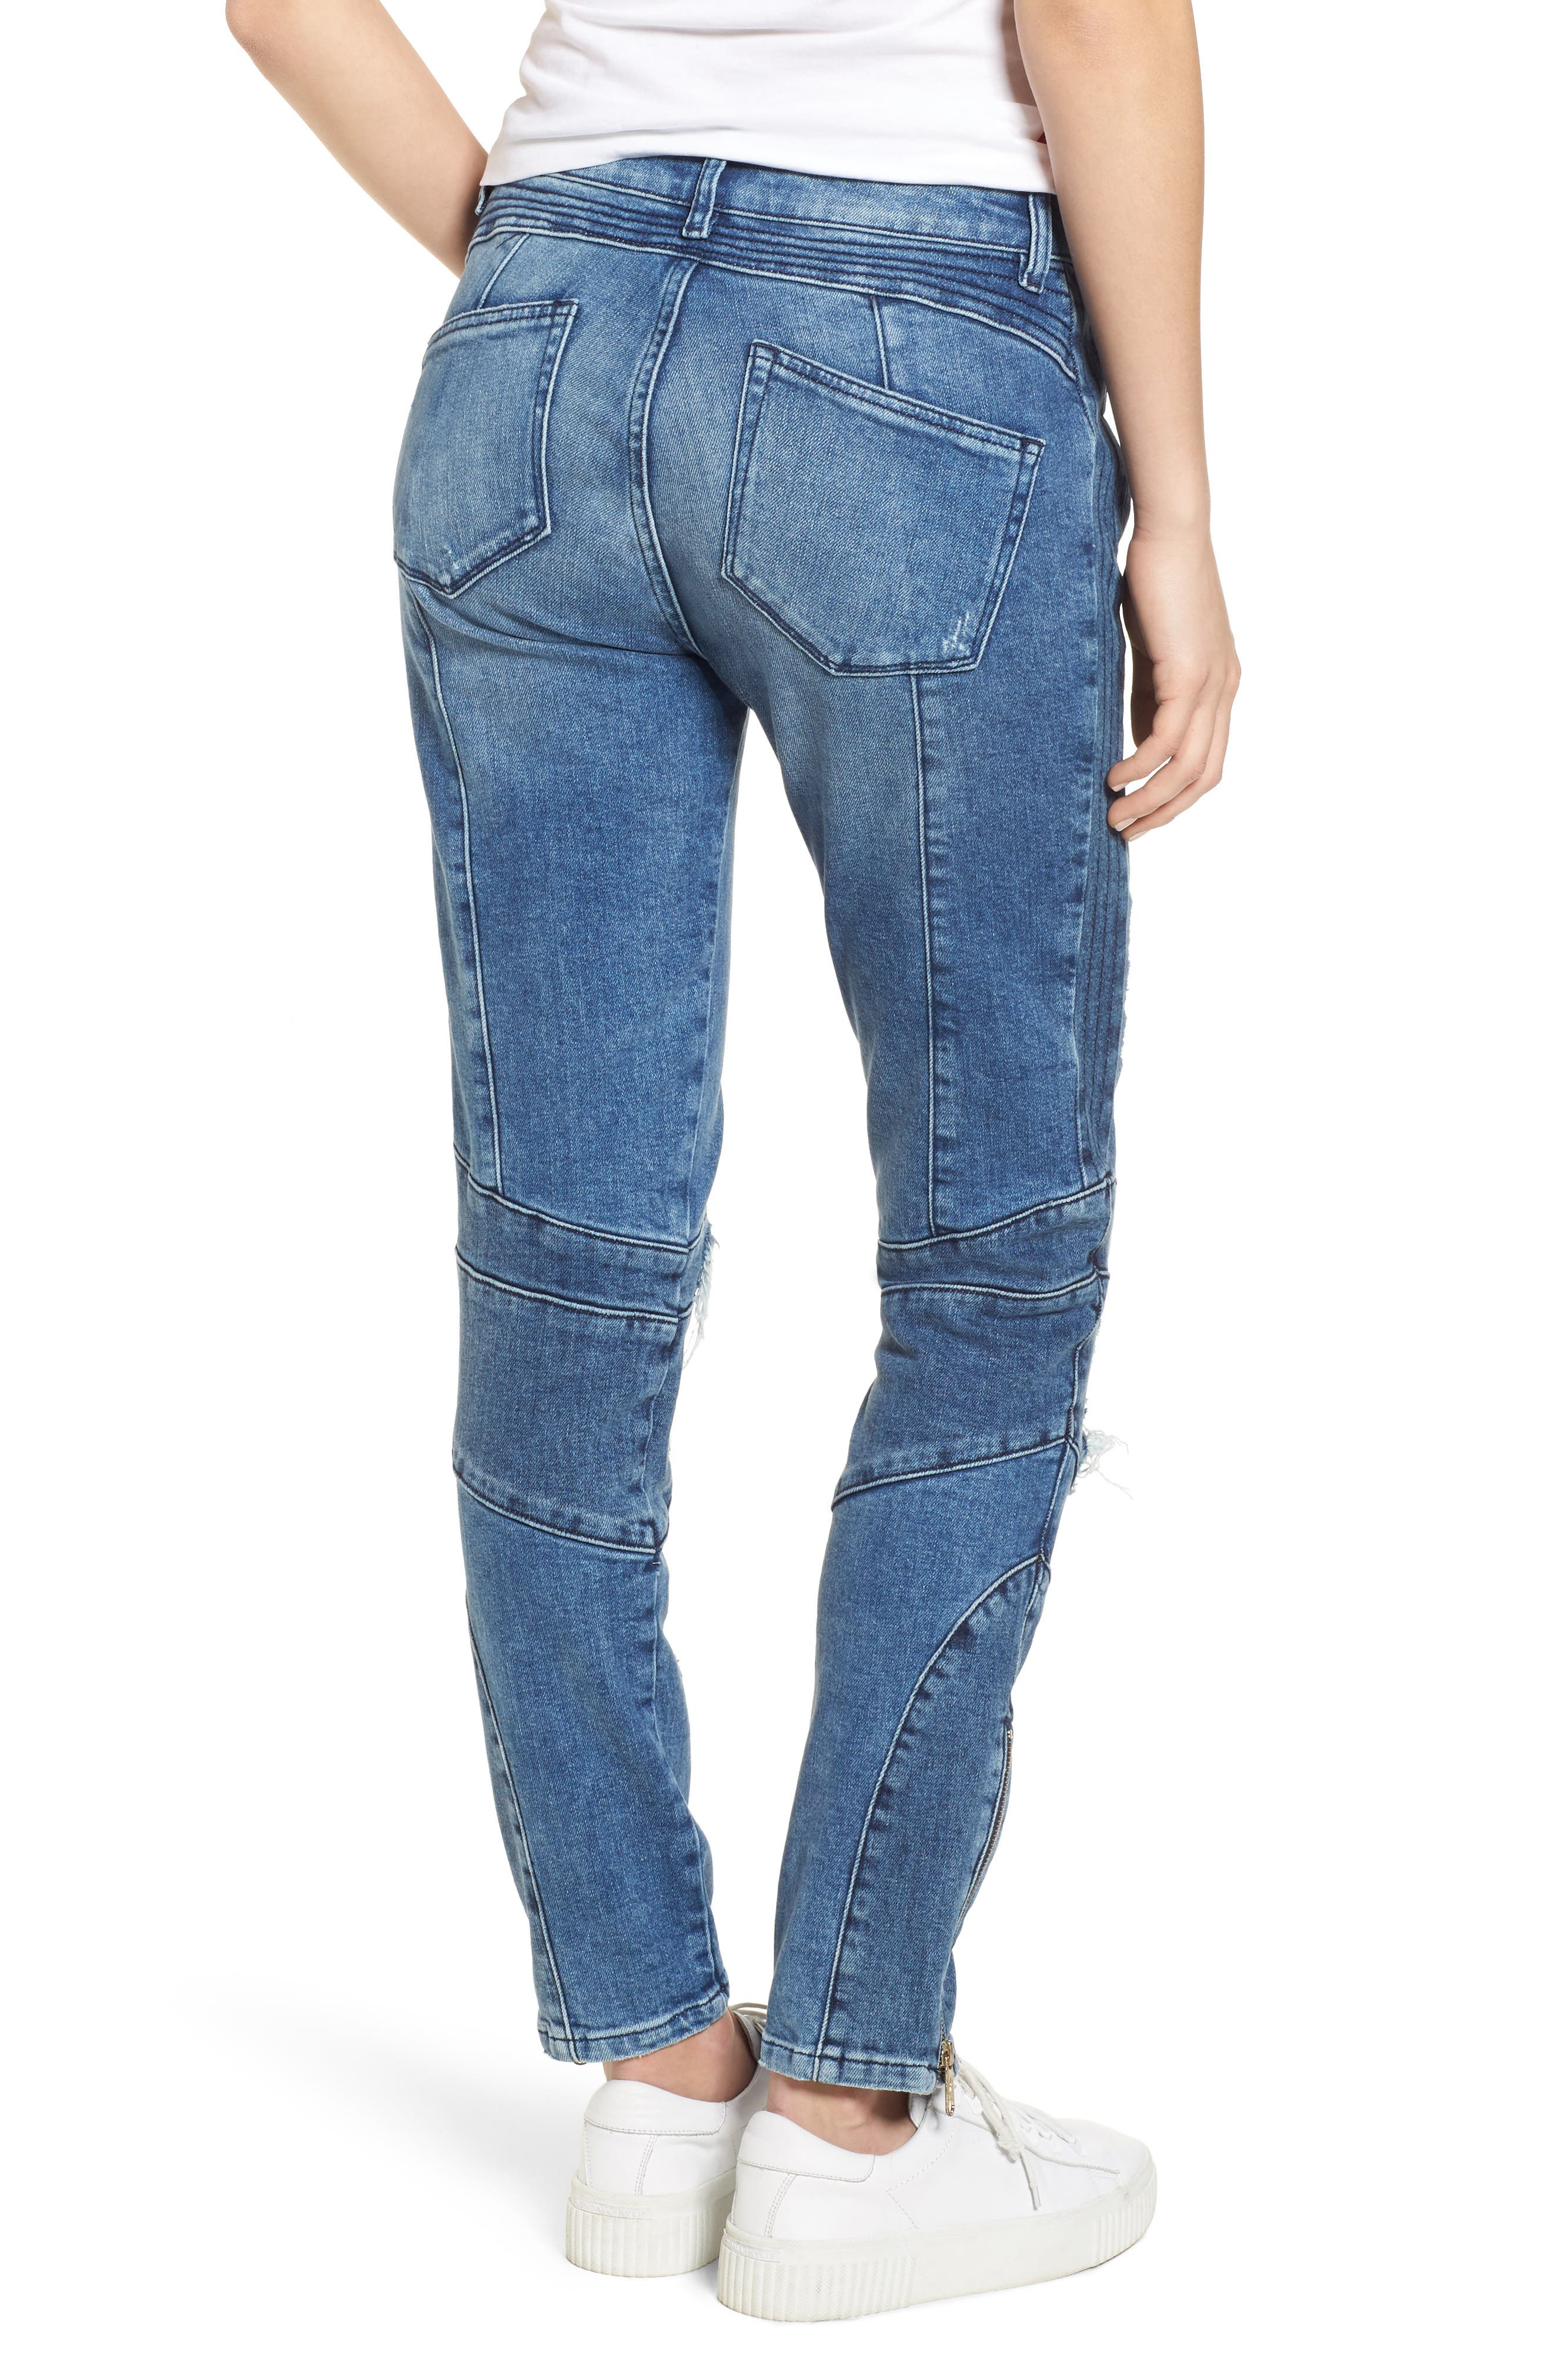 x Gigi Hadid Speed Distressed Ankle Zip Jeans,                             Alternate thumbnail 2, color,                             400